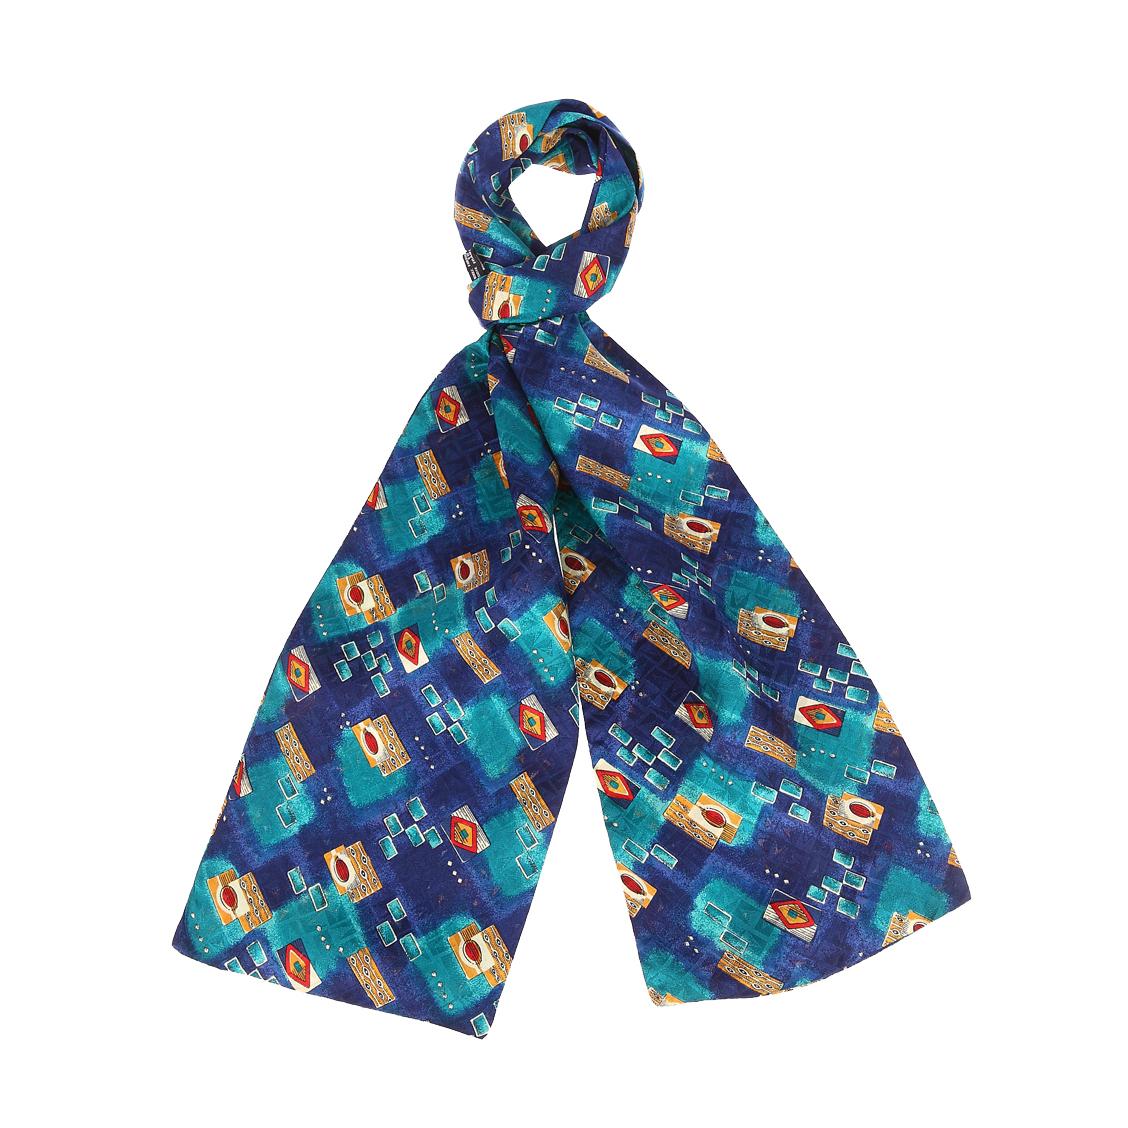 Echarpe en soie  bleu marine et vert turquoise à motifs